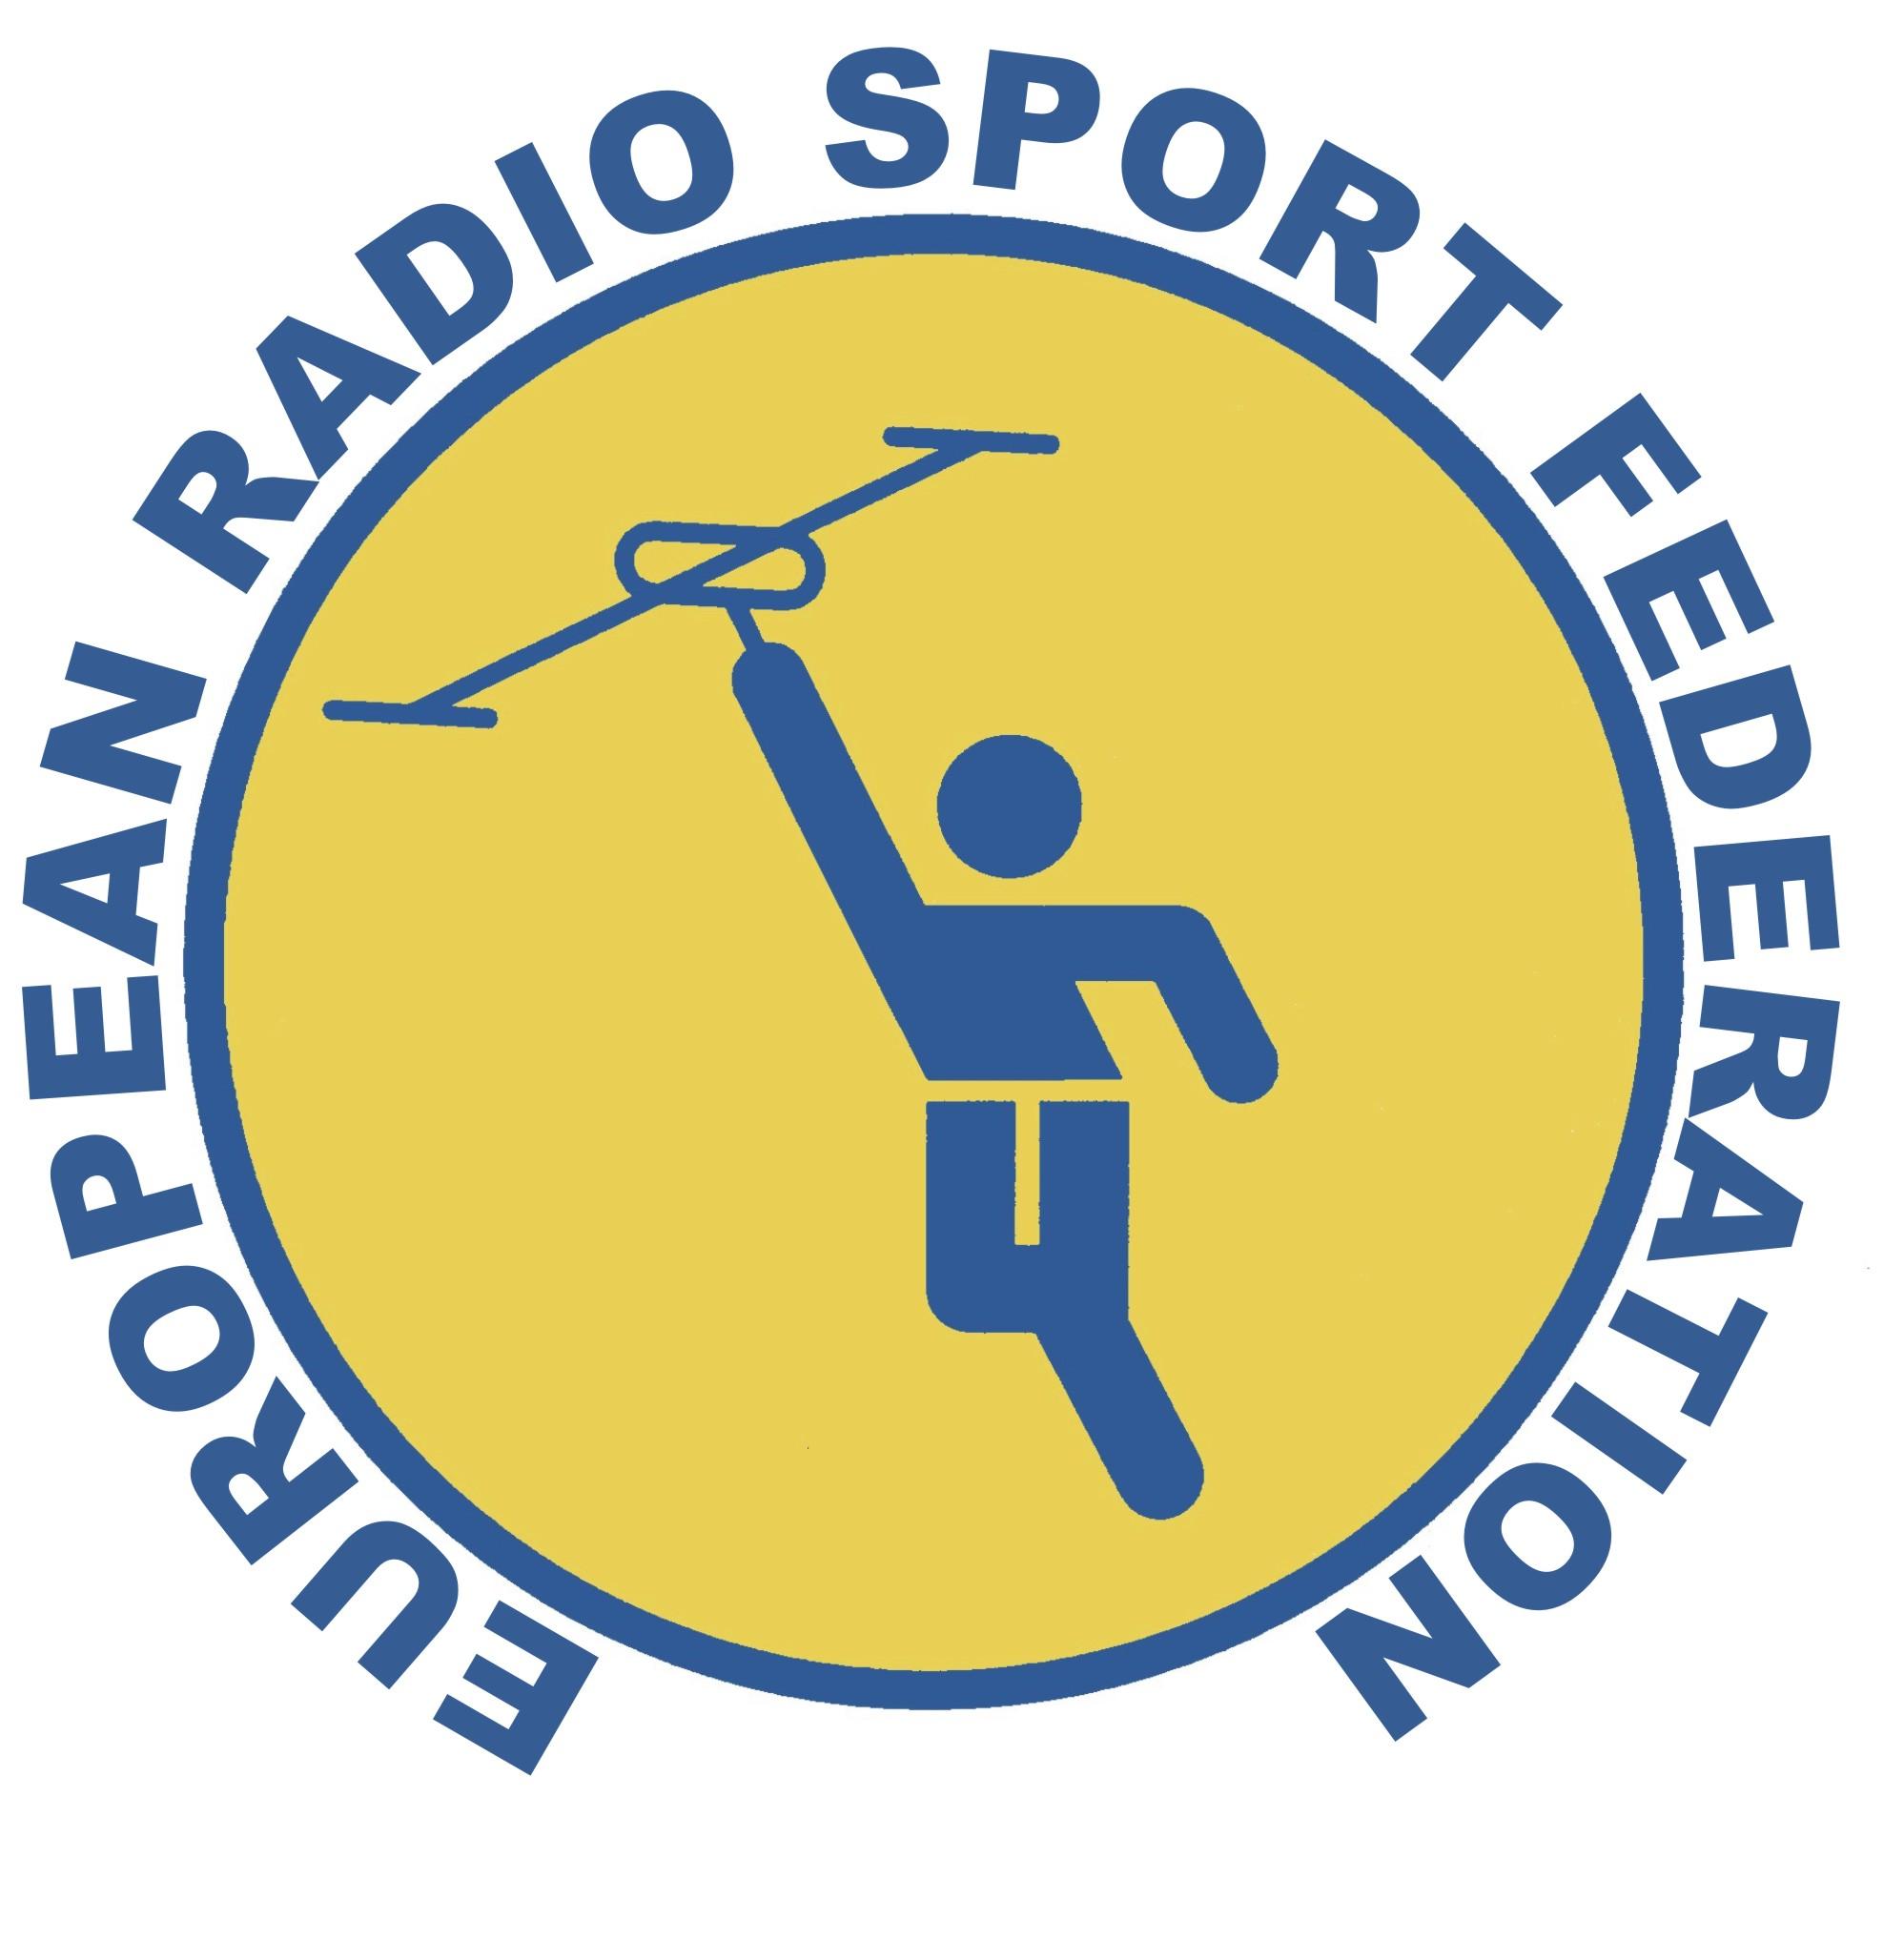 European radio sport federation